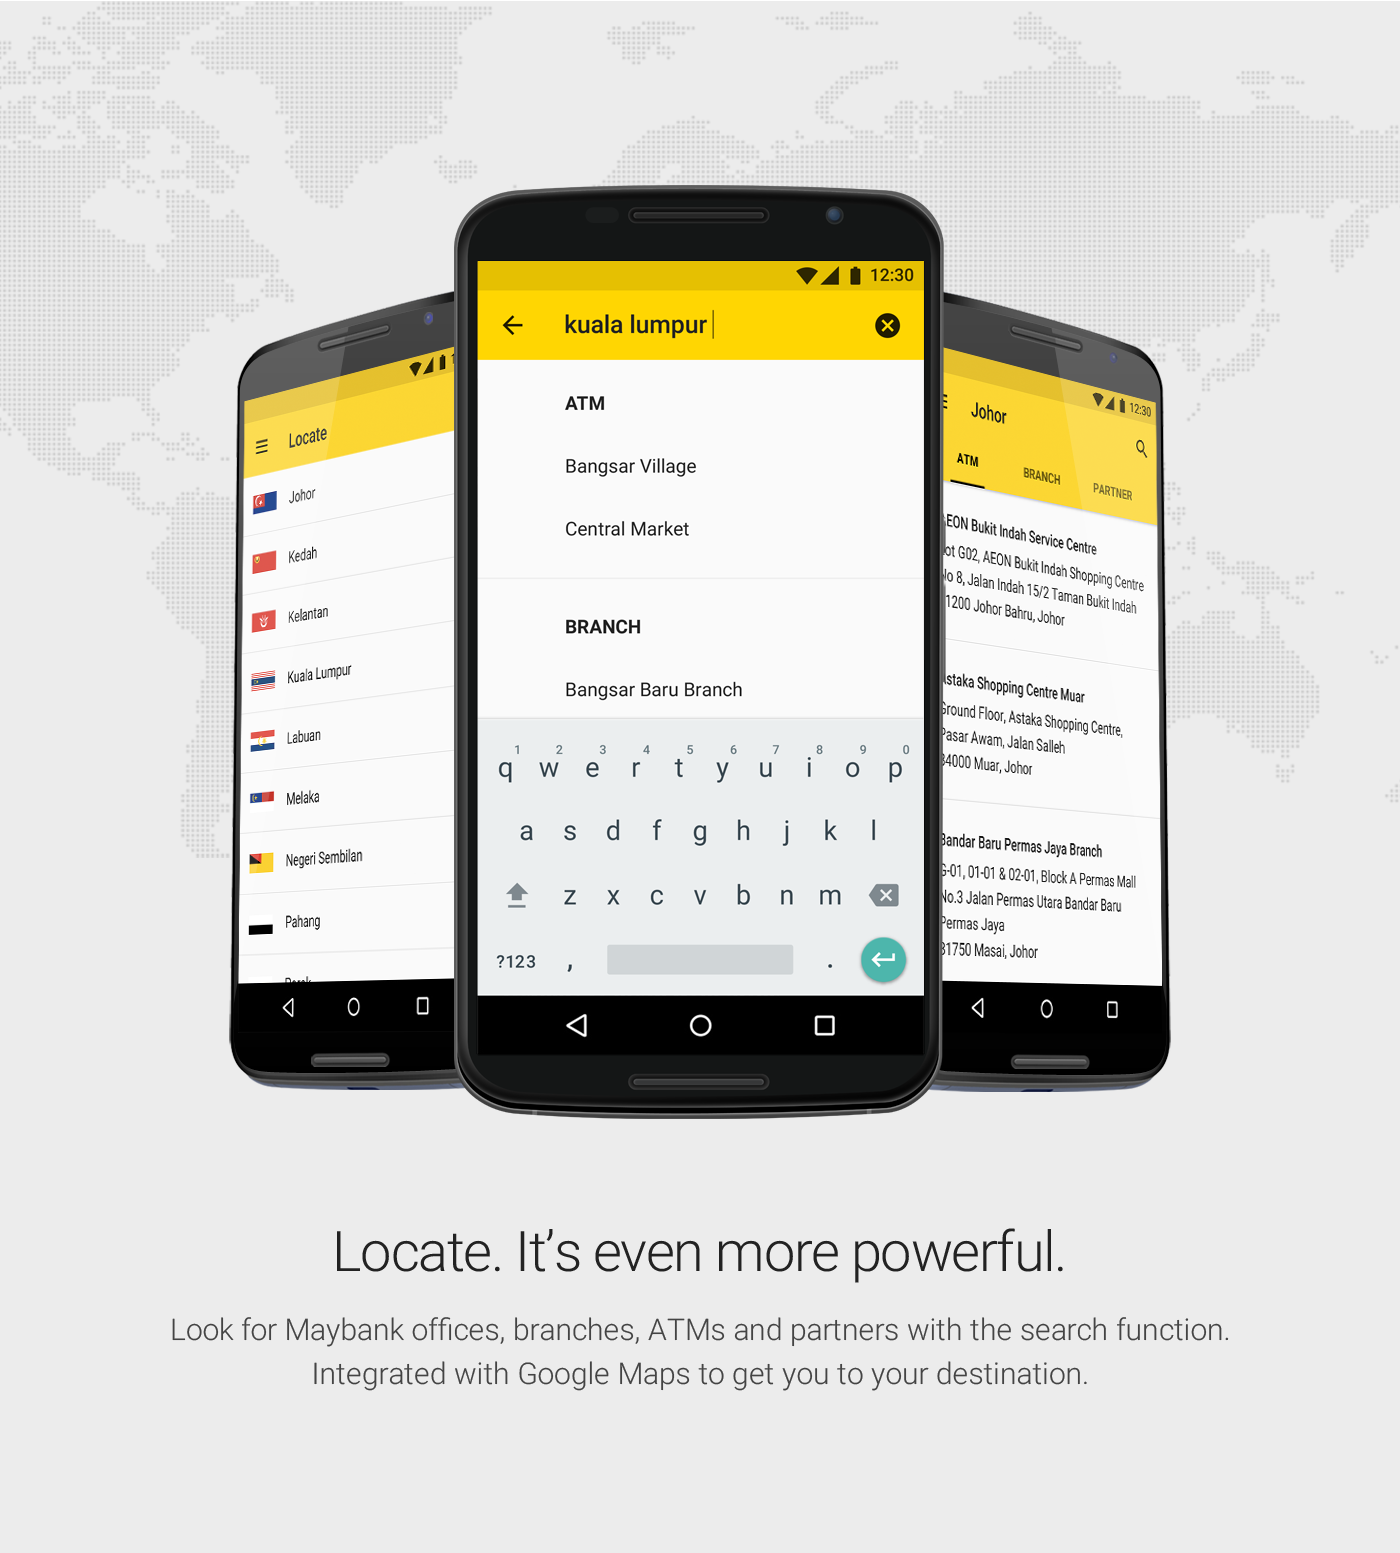 maybank material google Bank app malaysia